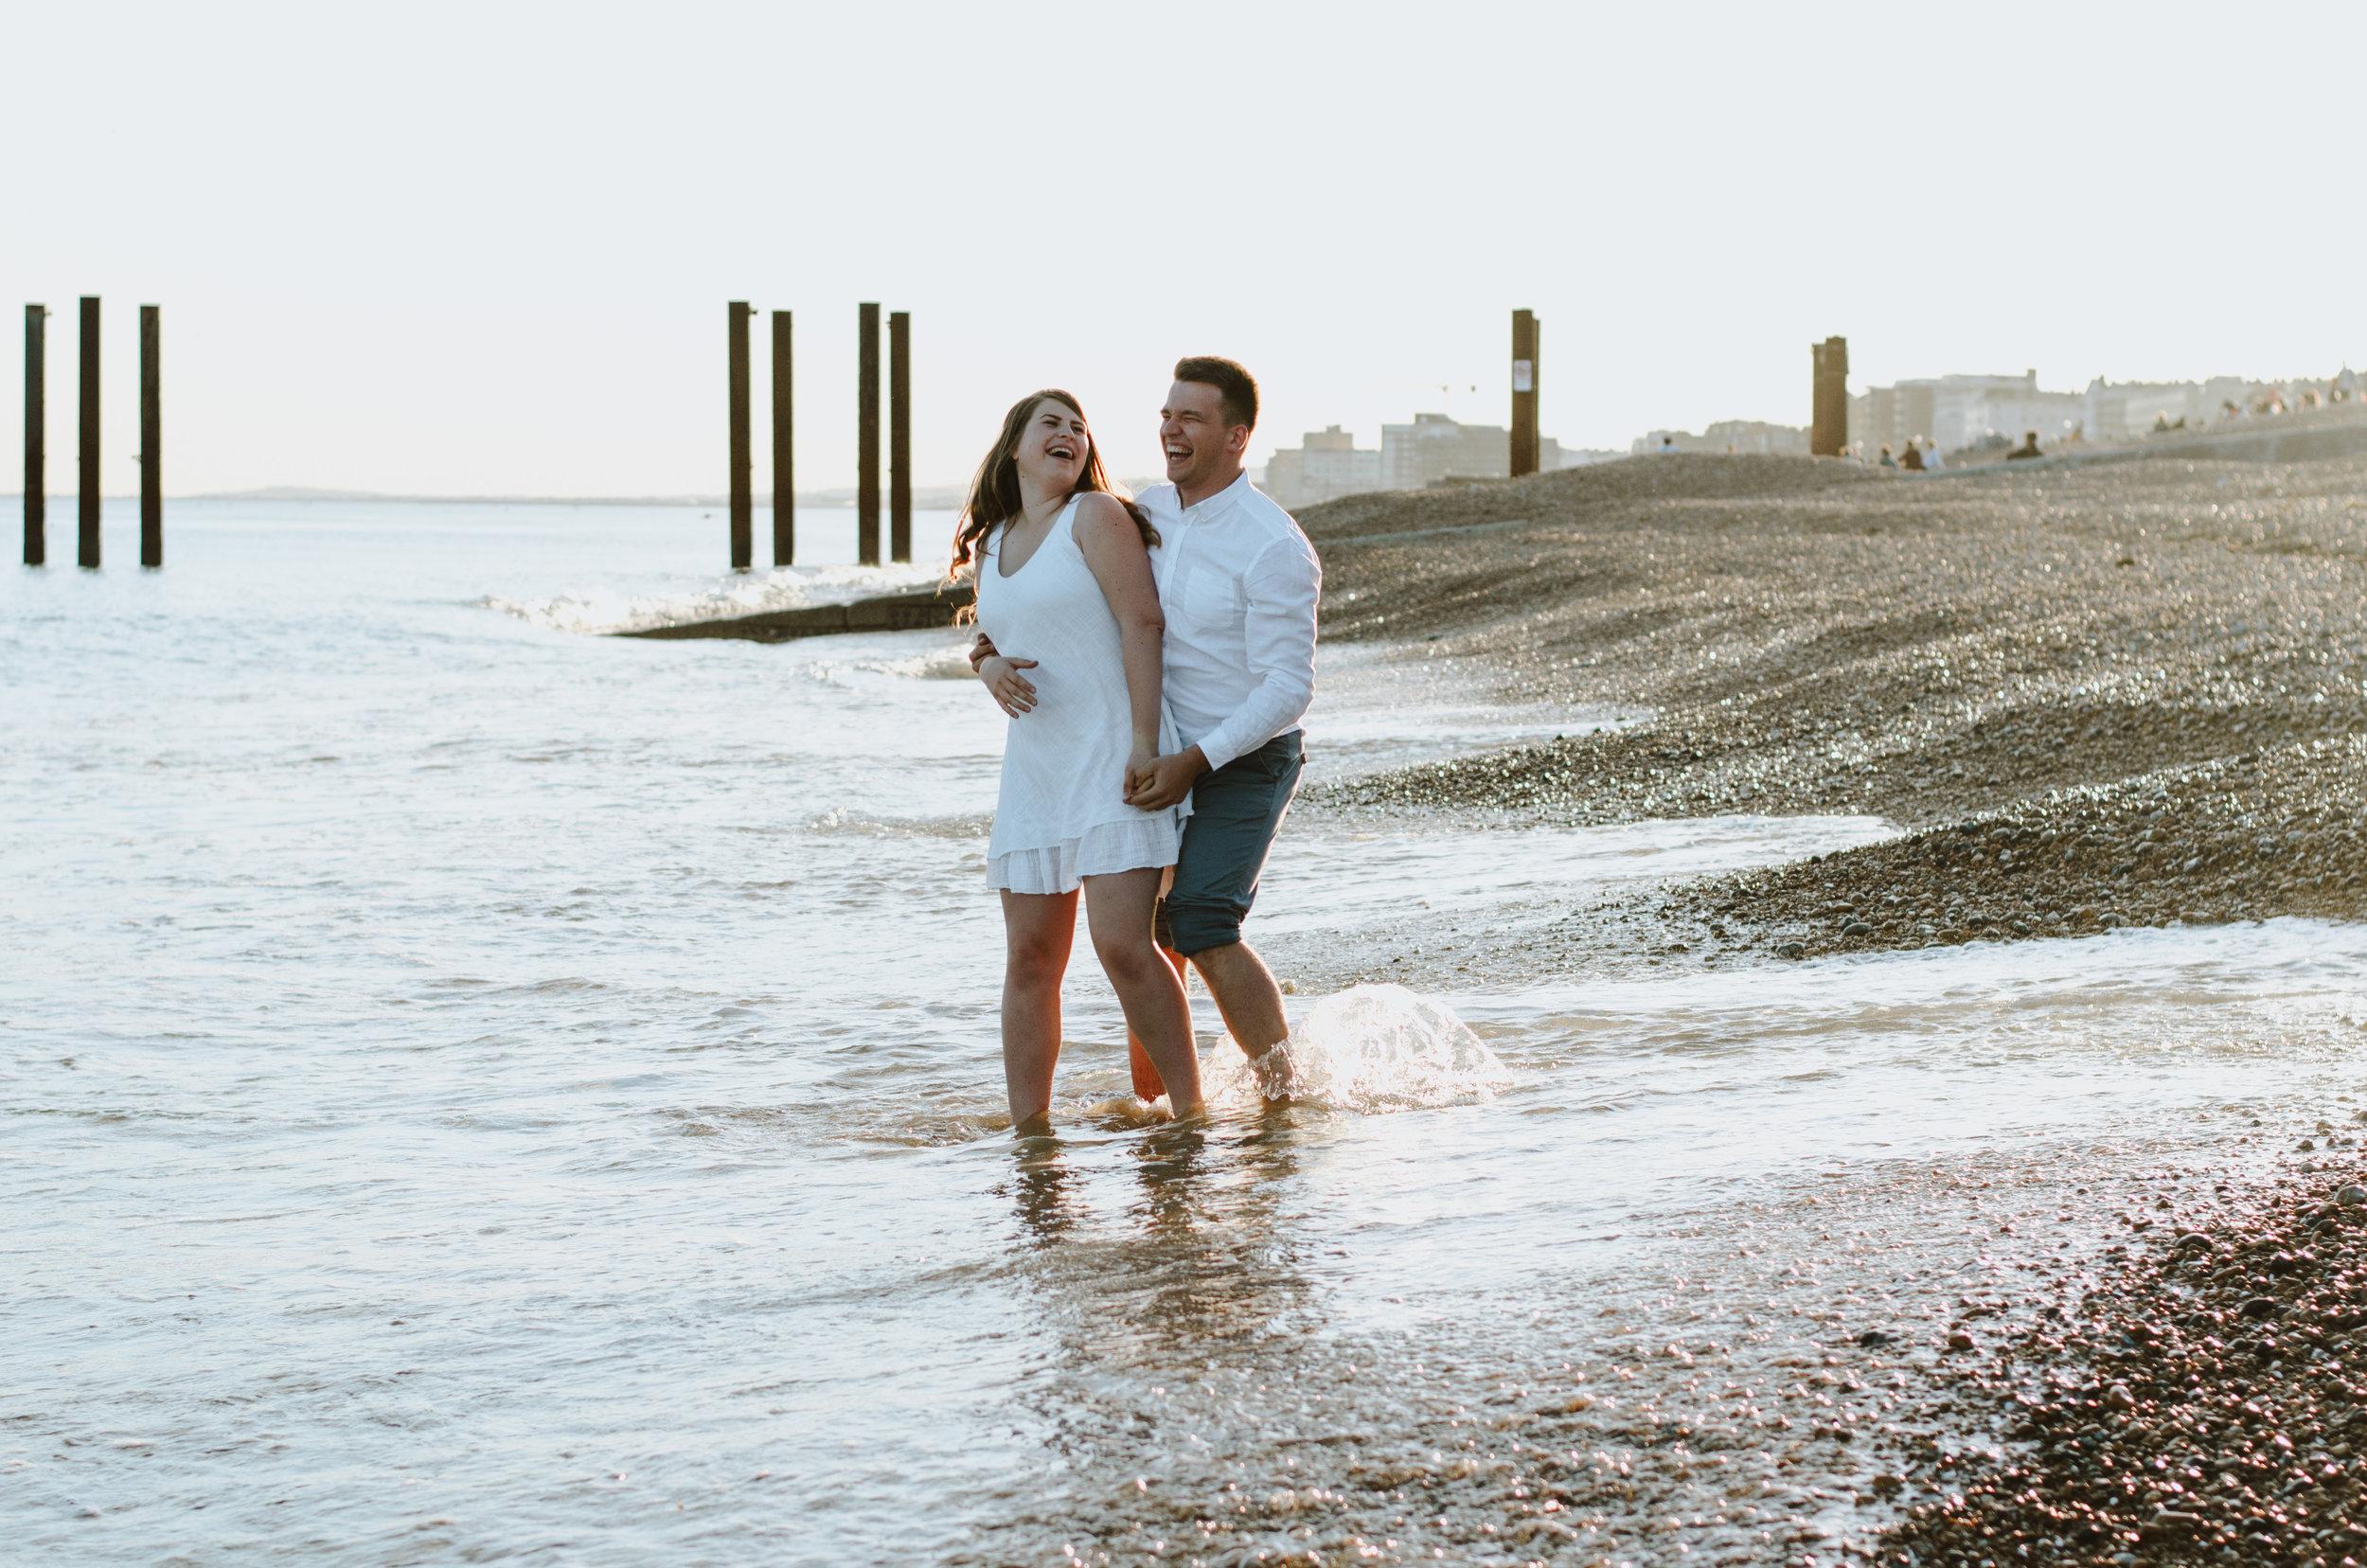 Ieva & Julius - Sneak Peeks - Aiste Saulyte Photography-3.jpg